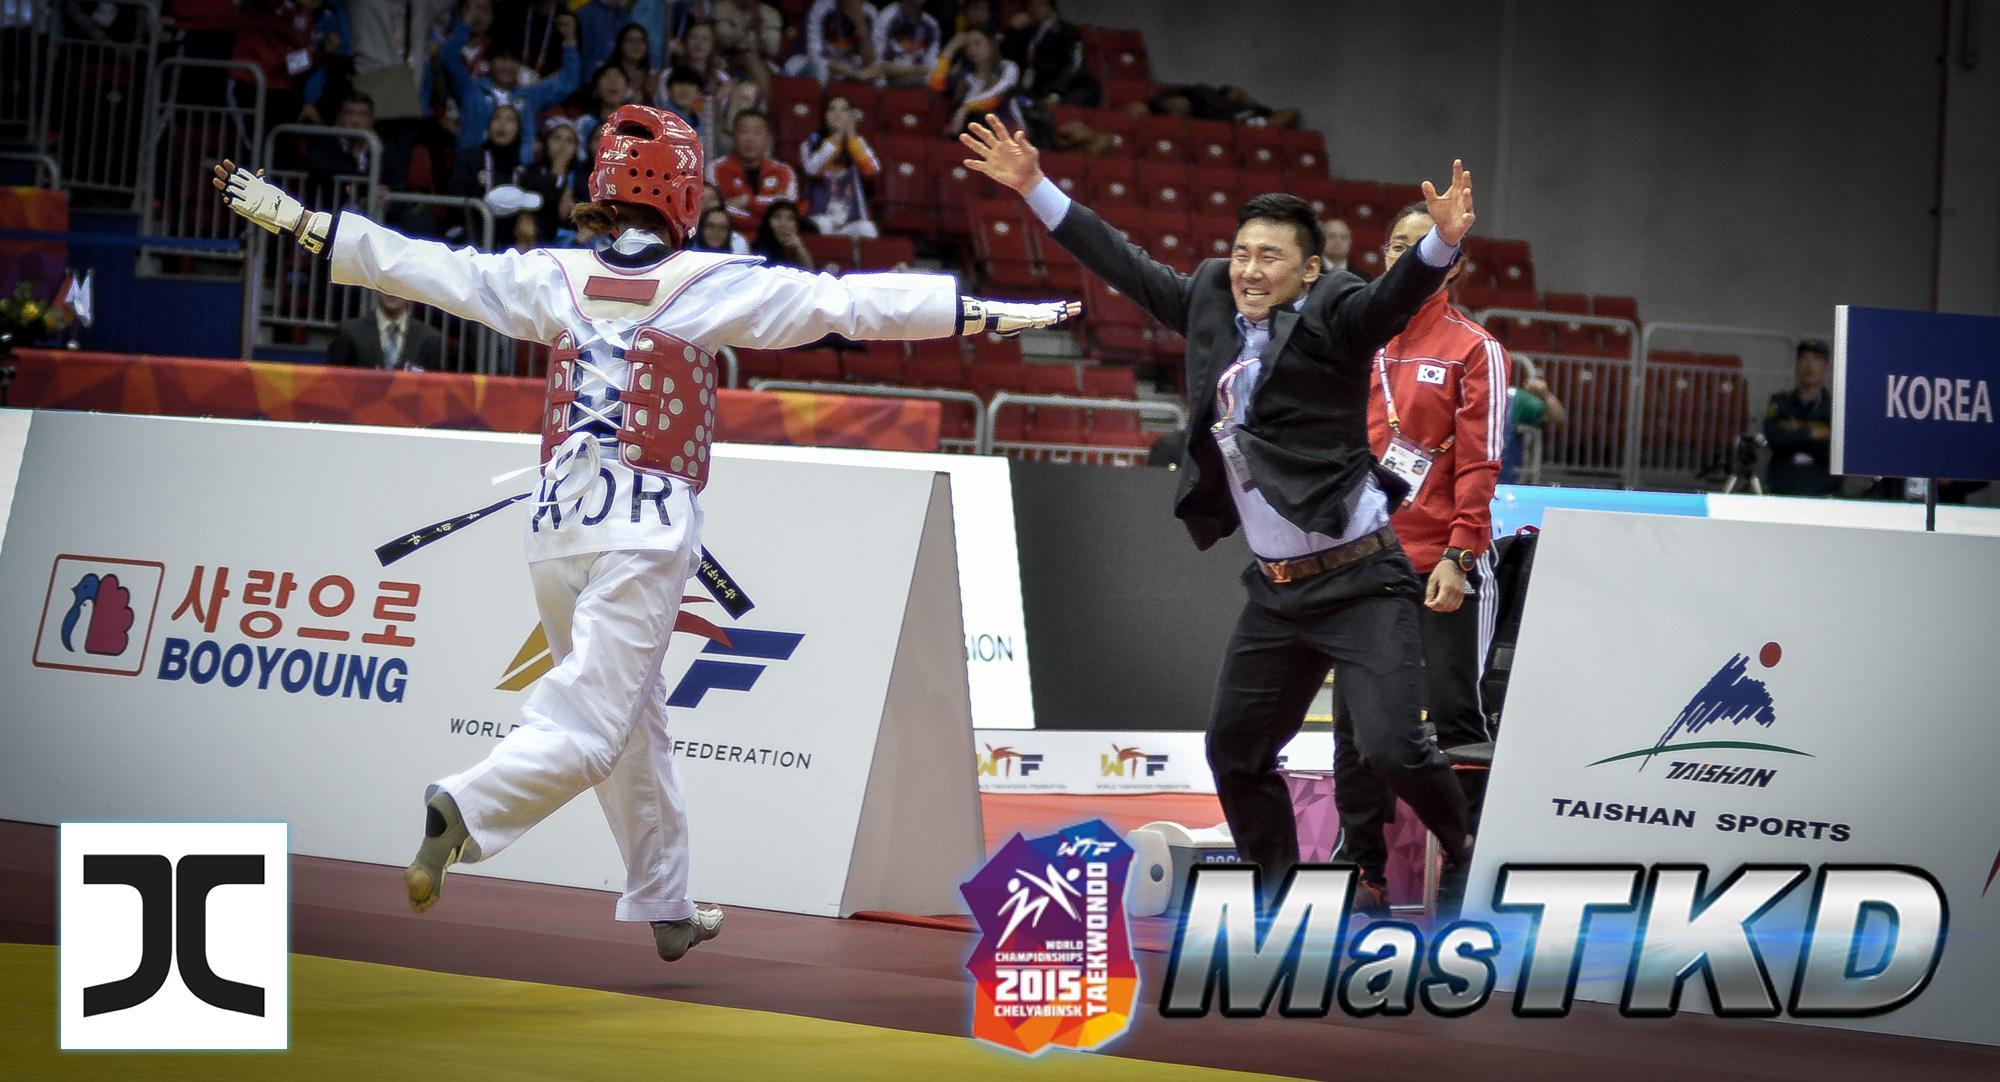 14_Seleccion_JCalicu_Mundial-Taekwondo-D3